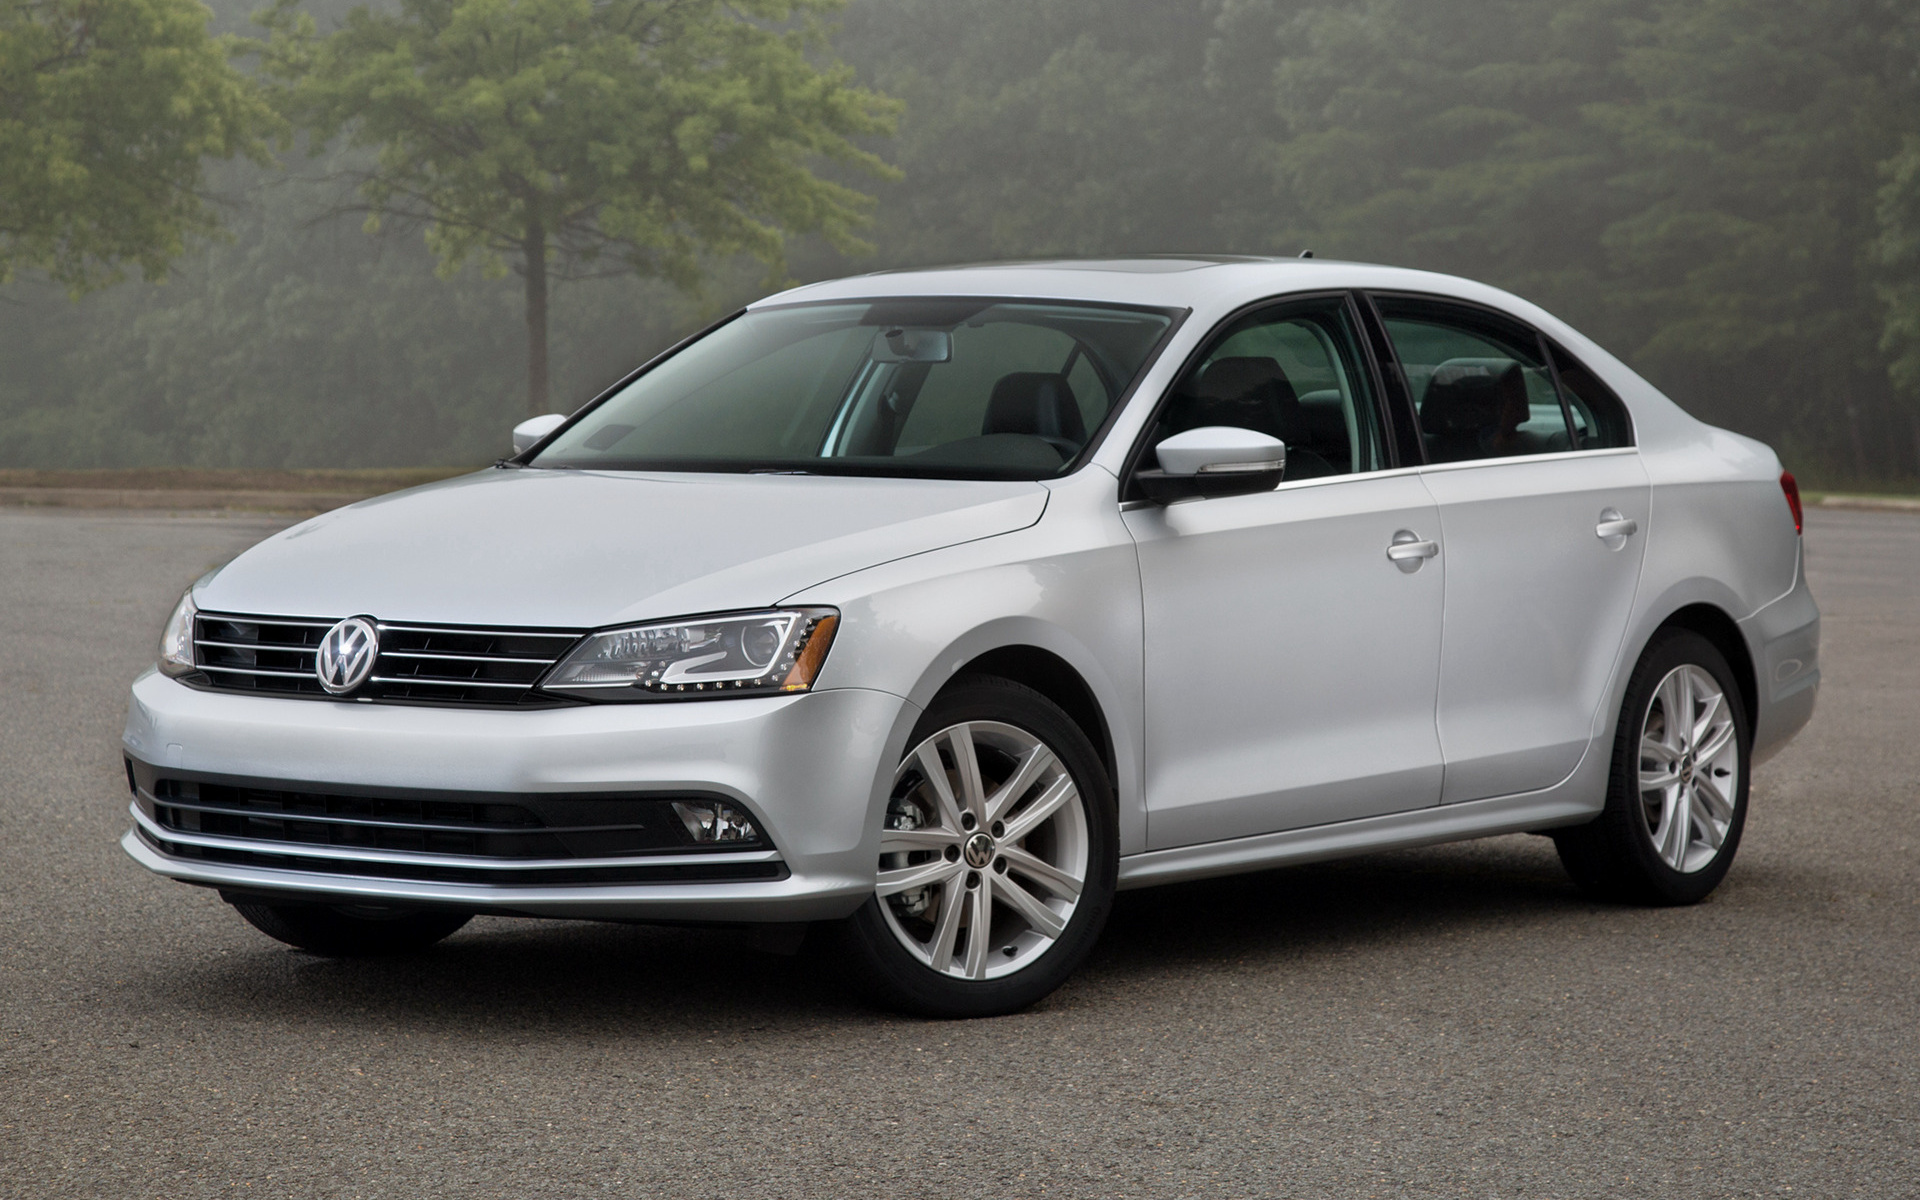 Satılık 2015 model Volkswagen Jetta